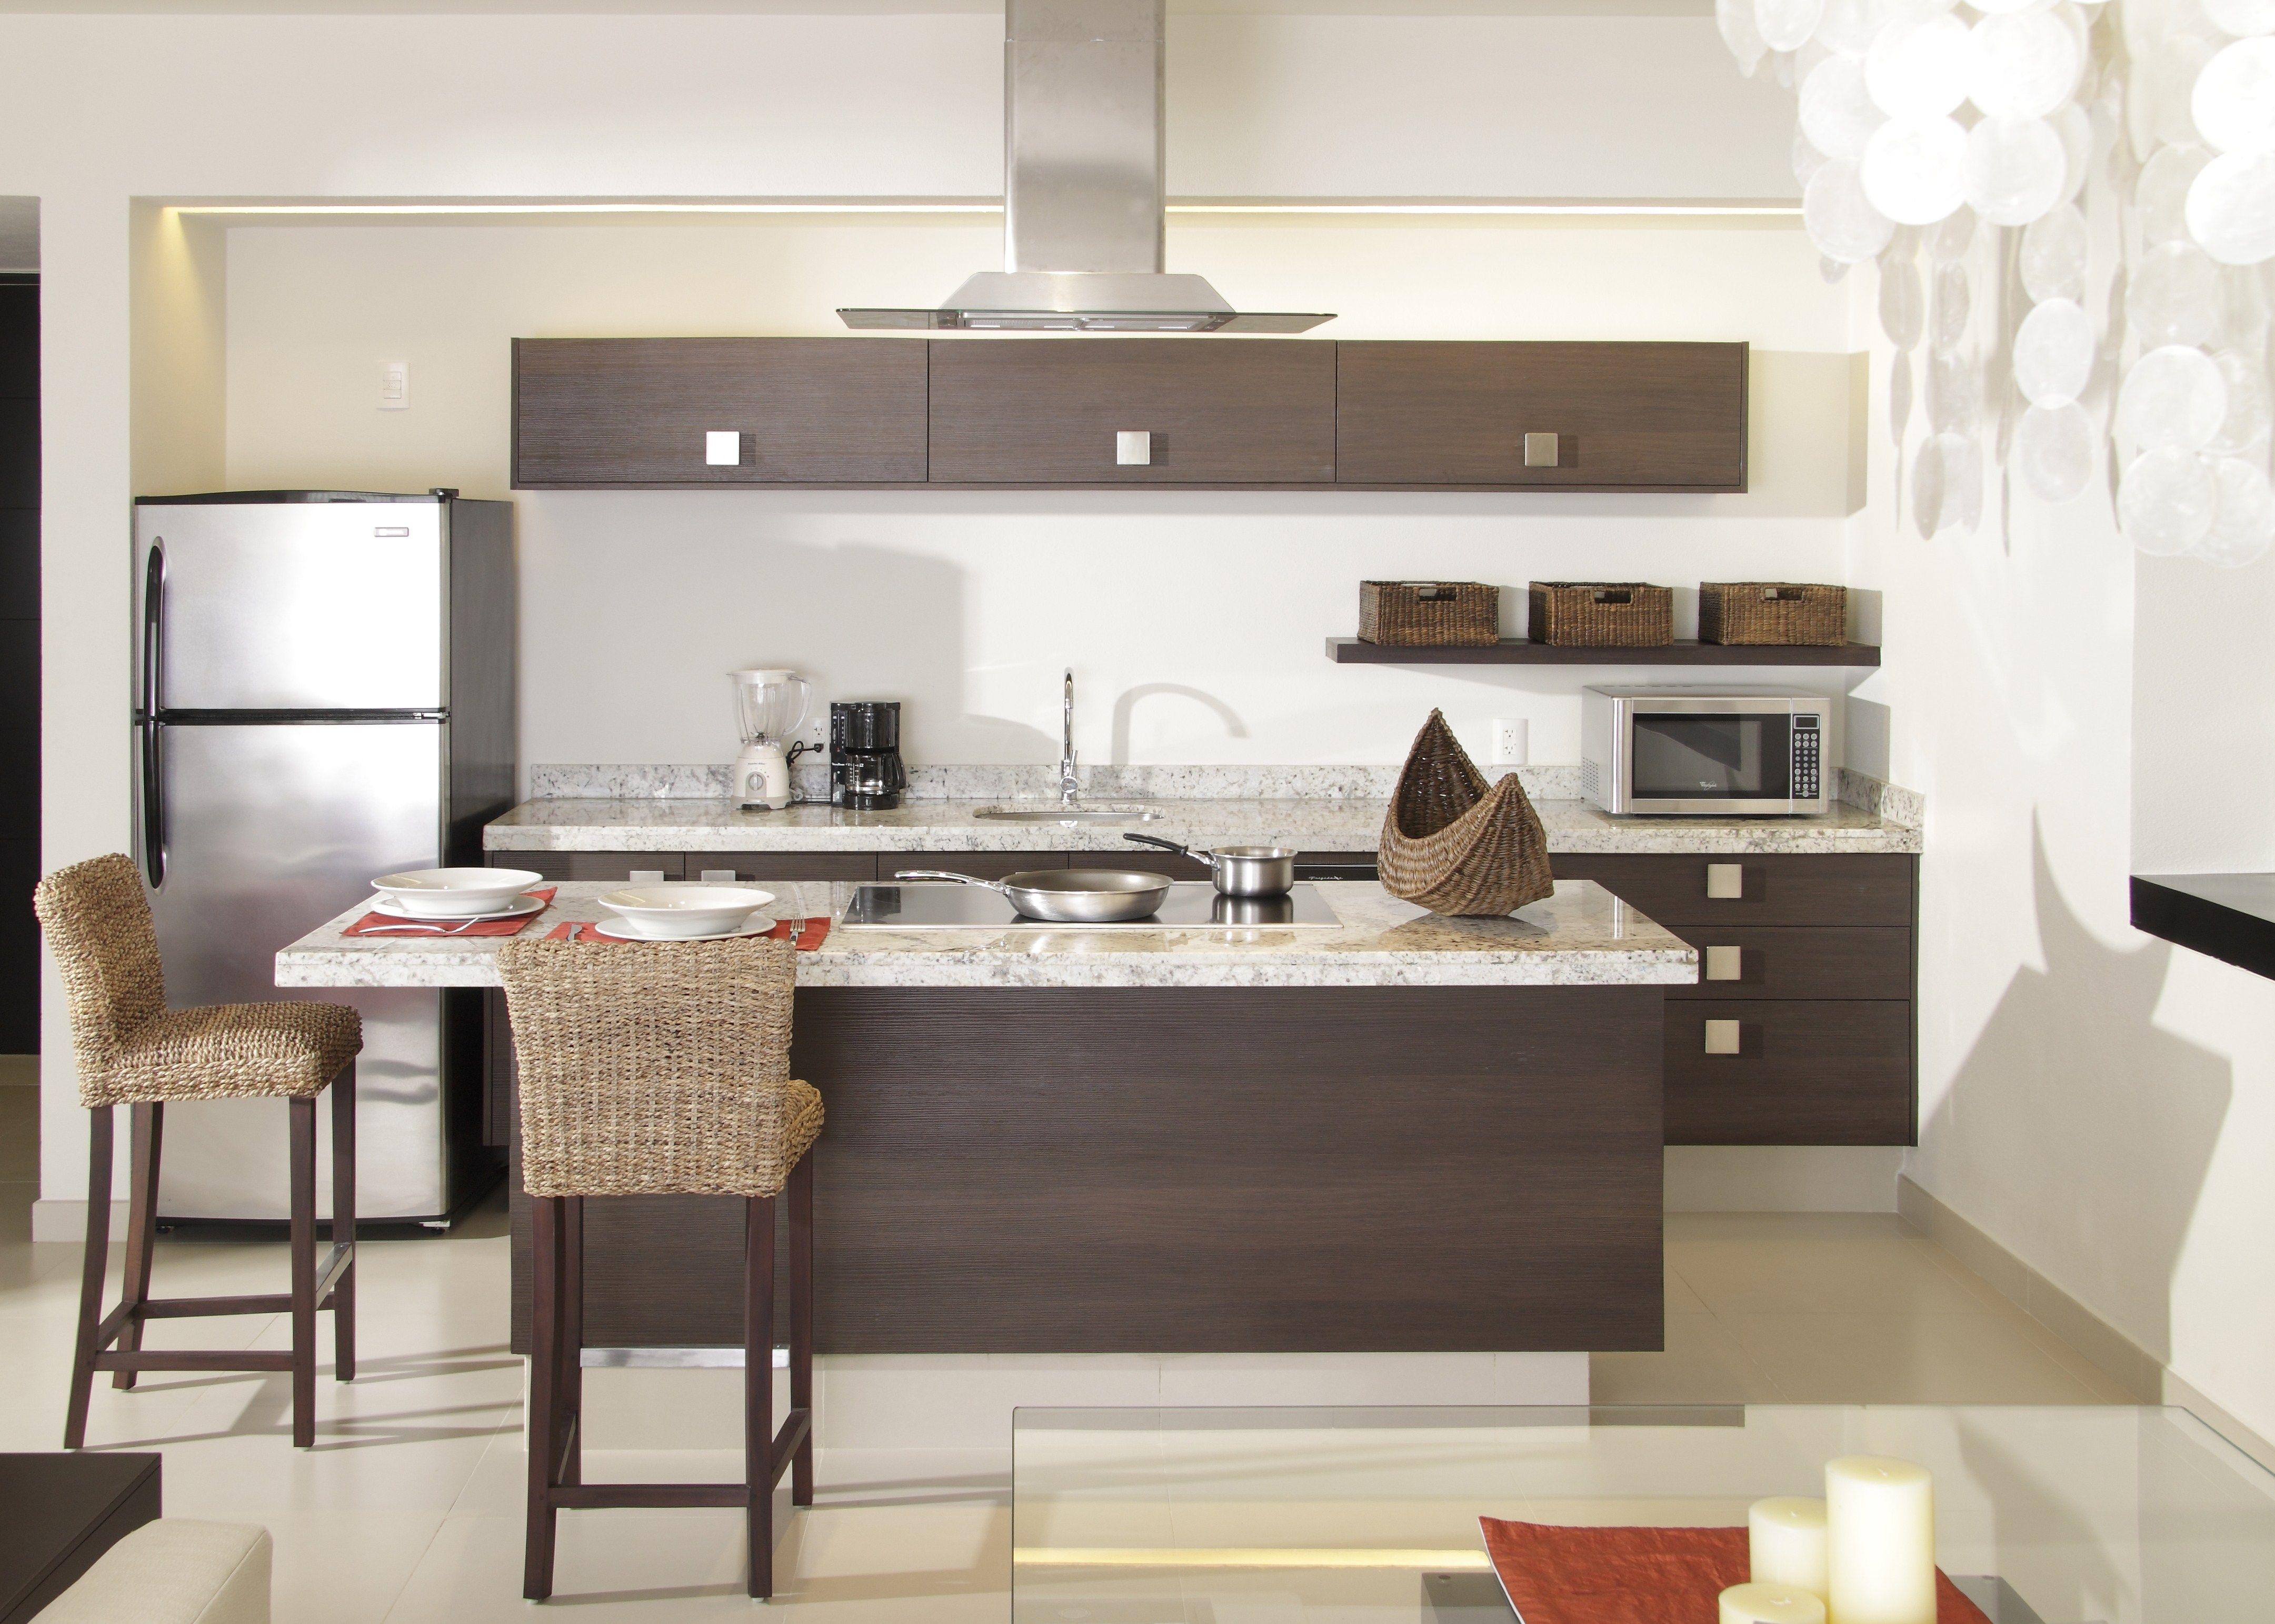 Como dise ar una casa peque a moderna buscar con google - Fotos de cocinas pequenas y modernas ...